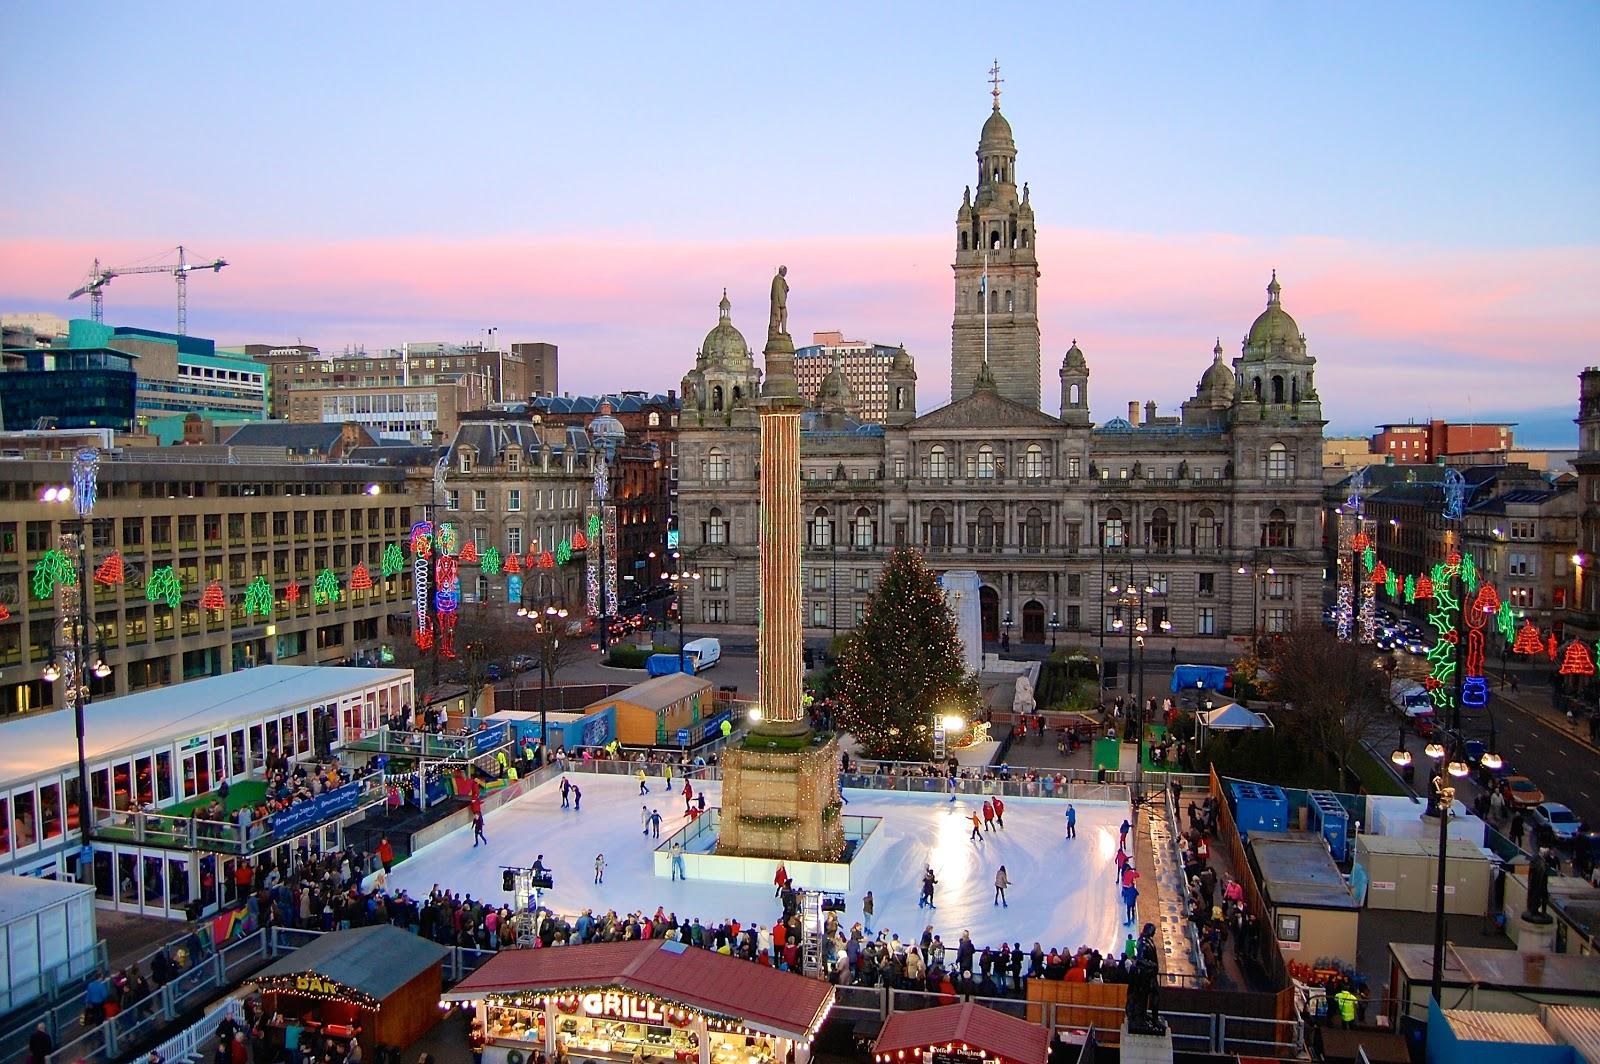 Winter festivities in St. George's Square in Glasgow, Scotland